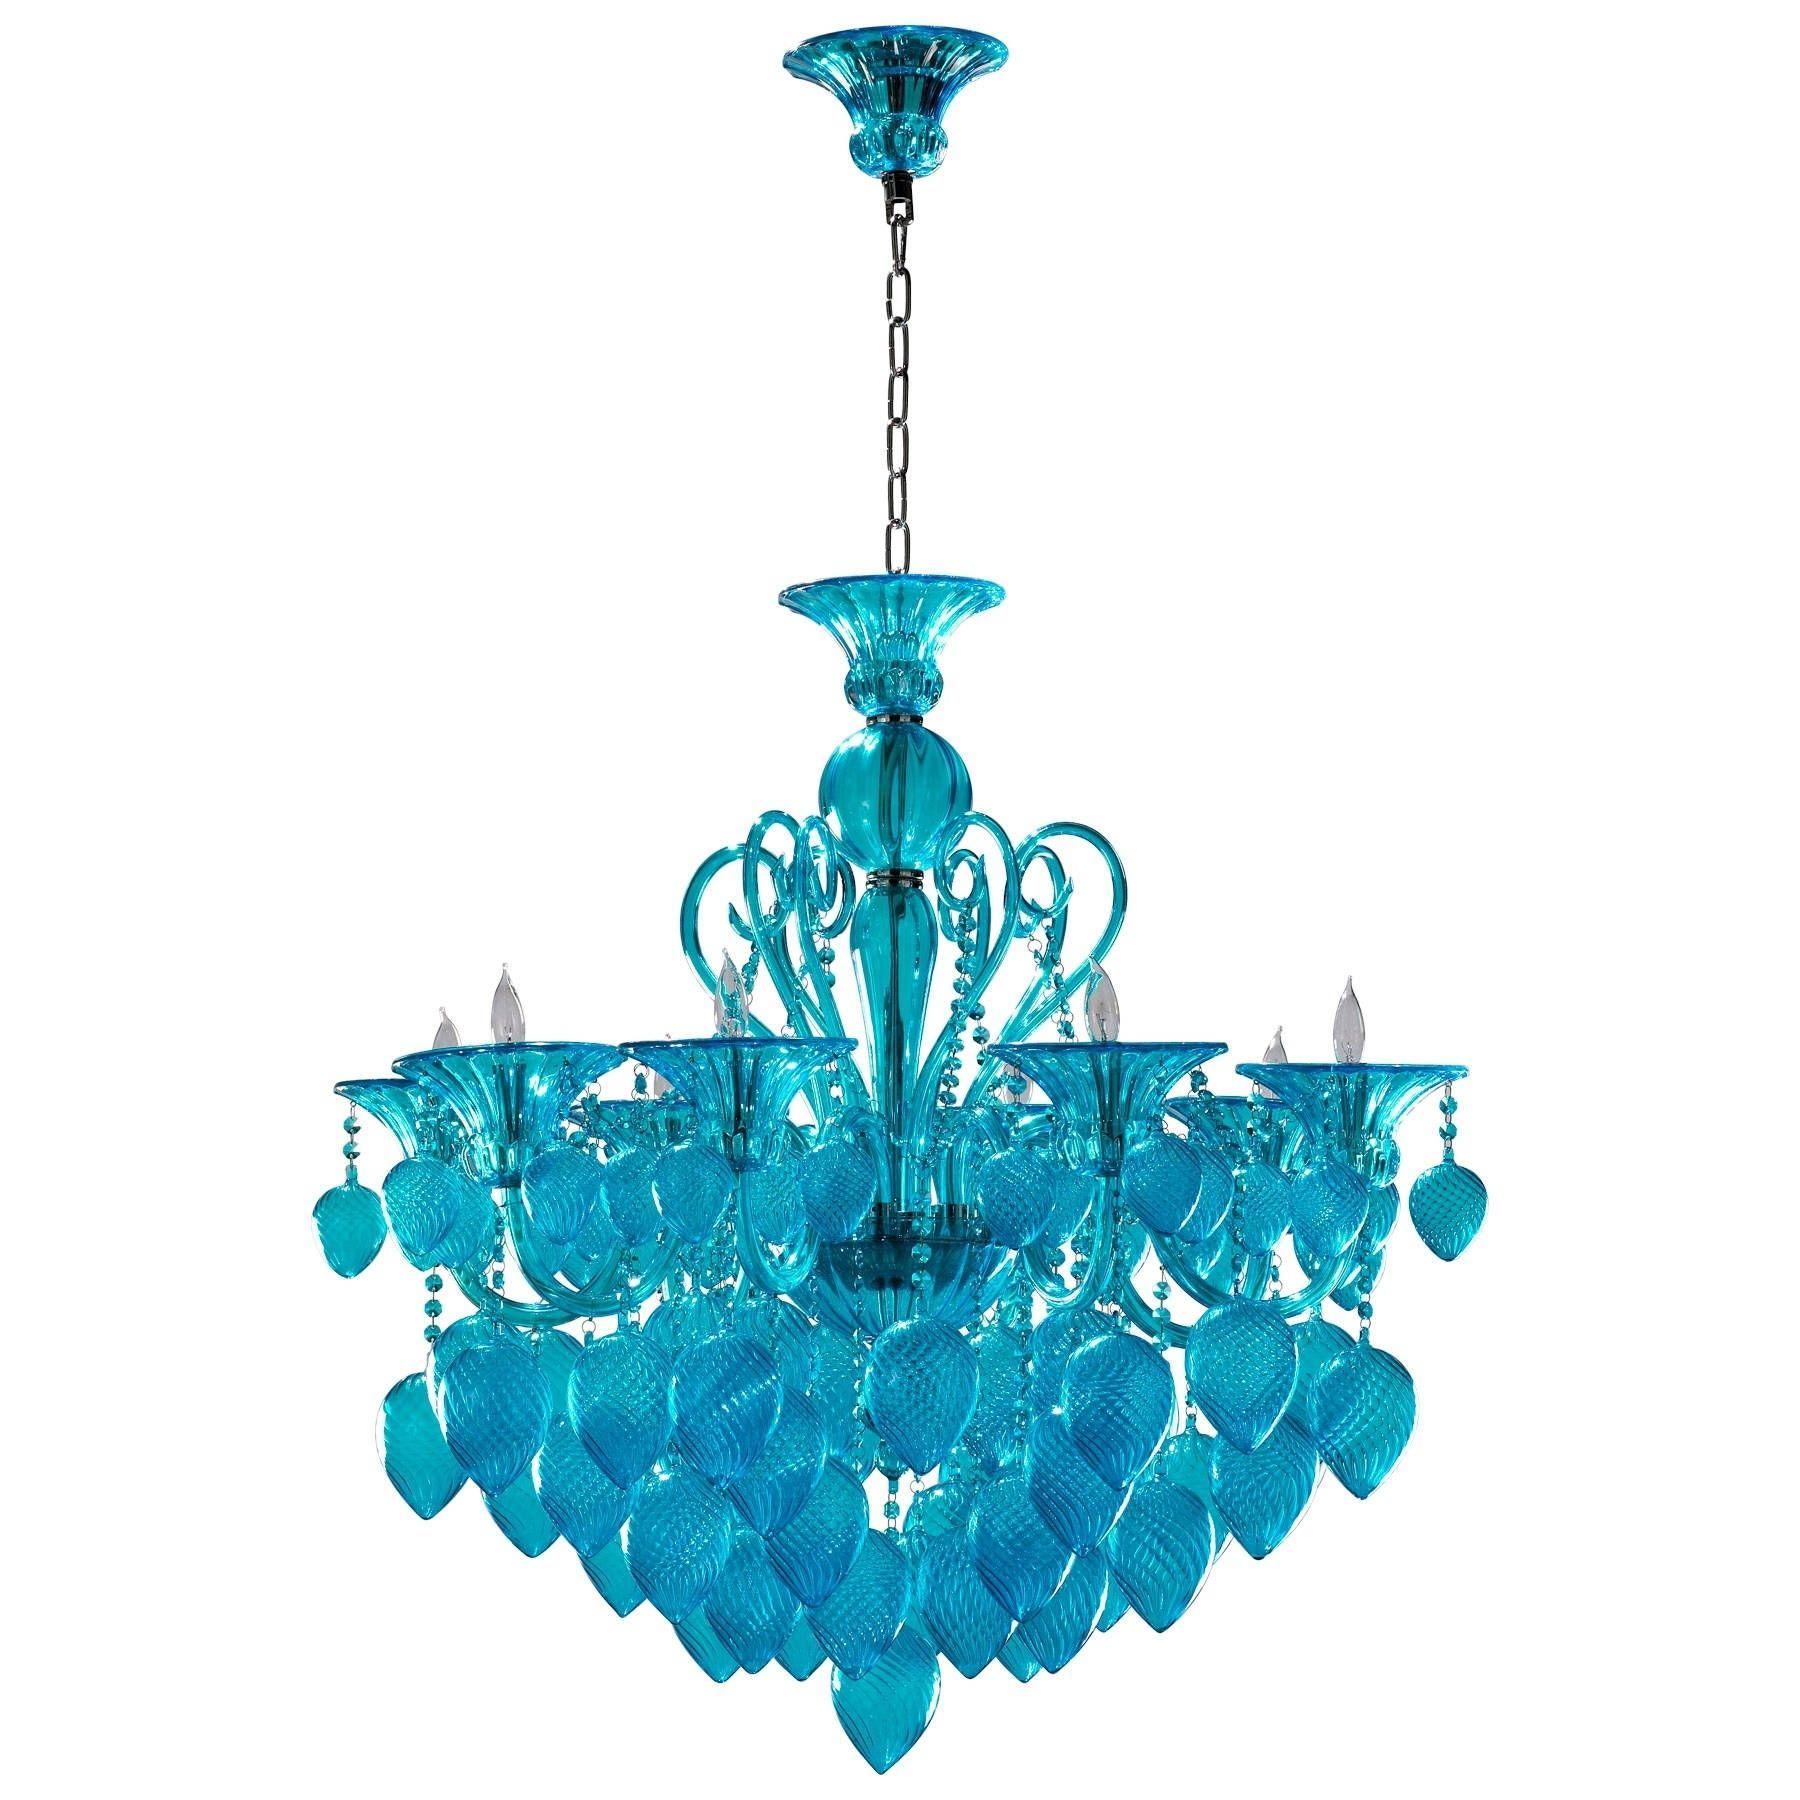 Bella Vetro Chandelier Blue aqua Art Glass